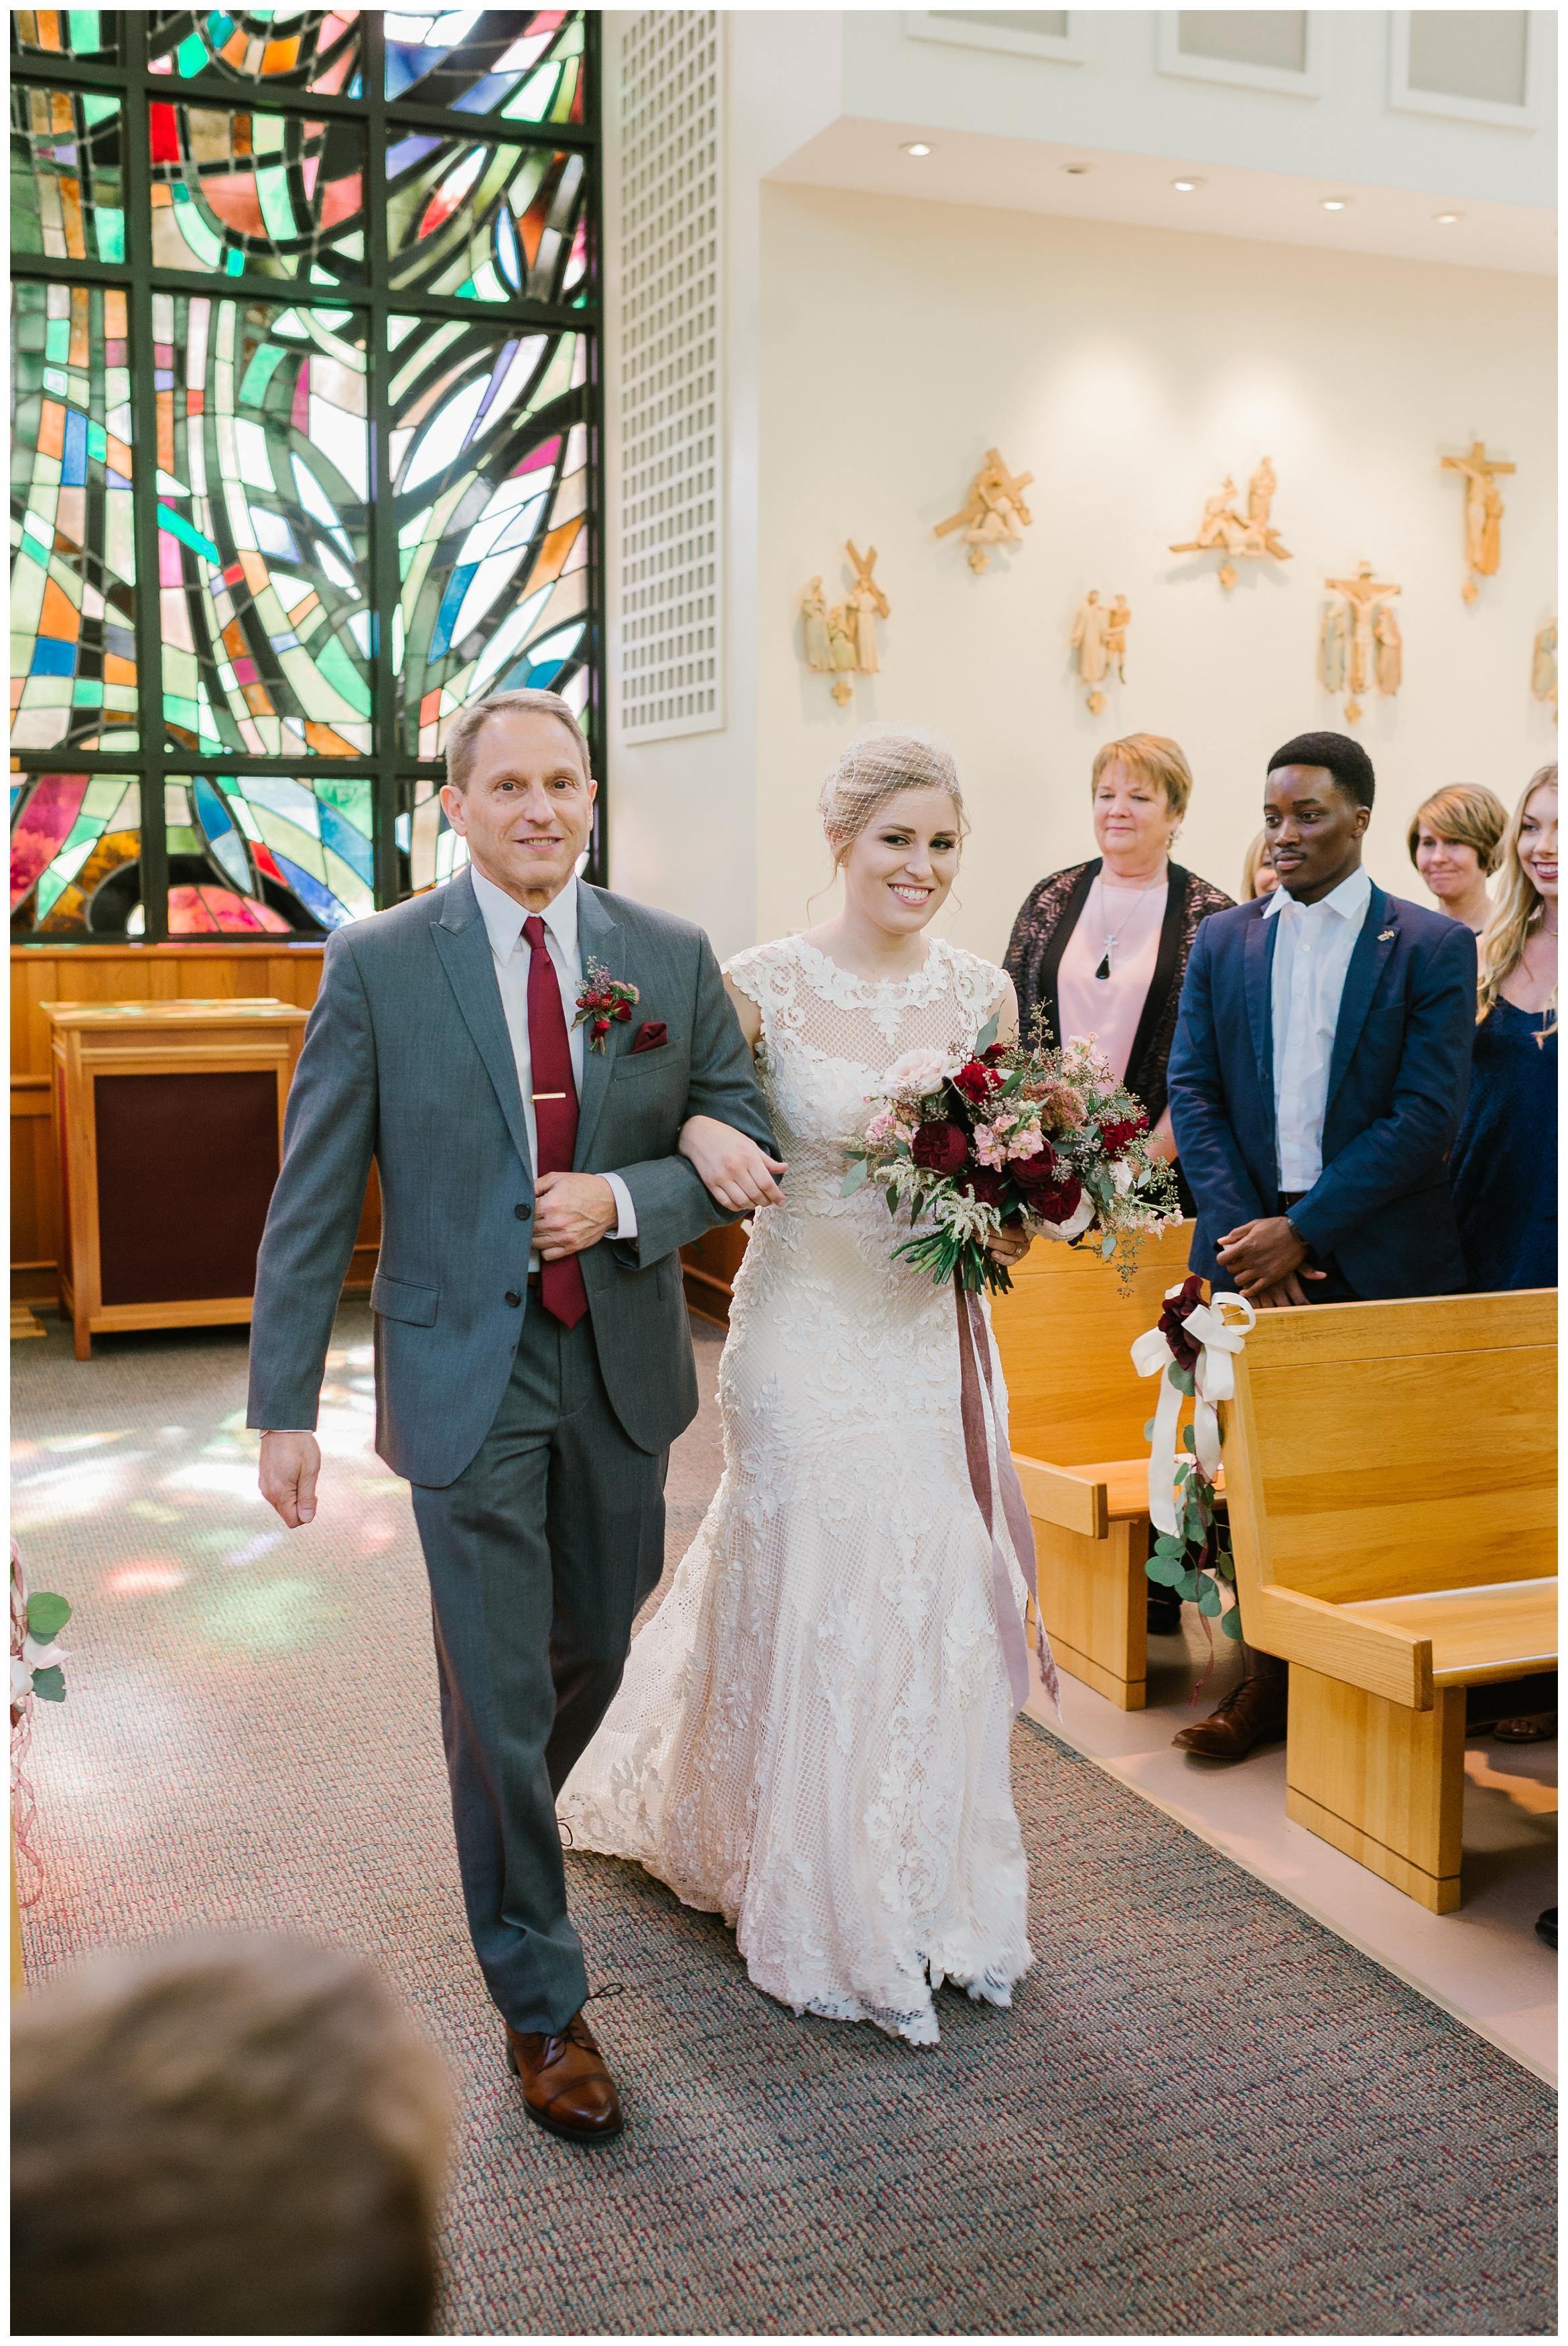 Rebecca_Shehorn_Photography_Indianapolis_Wedding_Photographer_7344.jpg